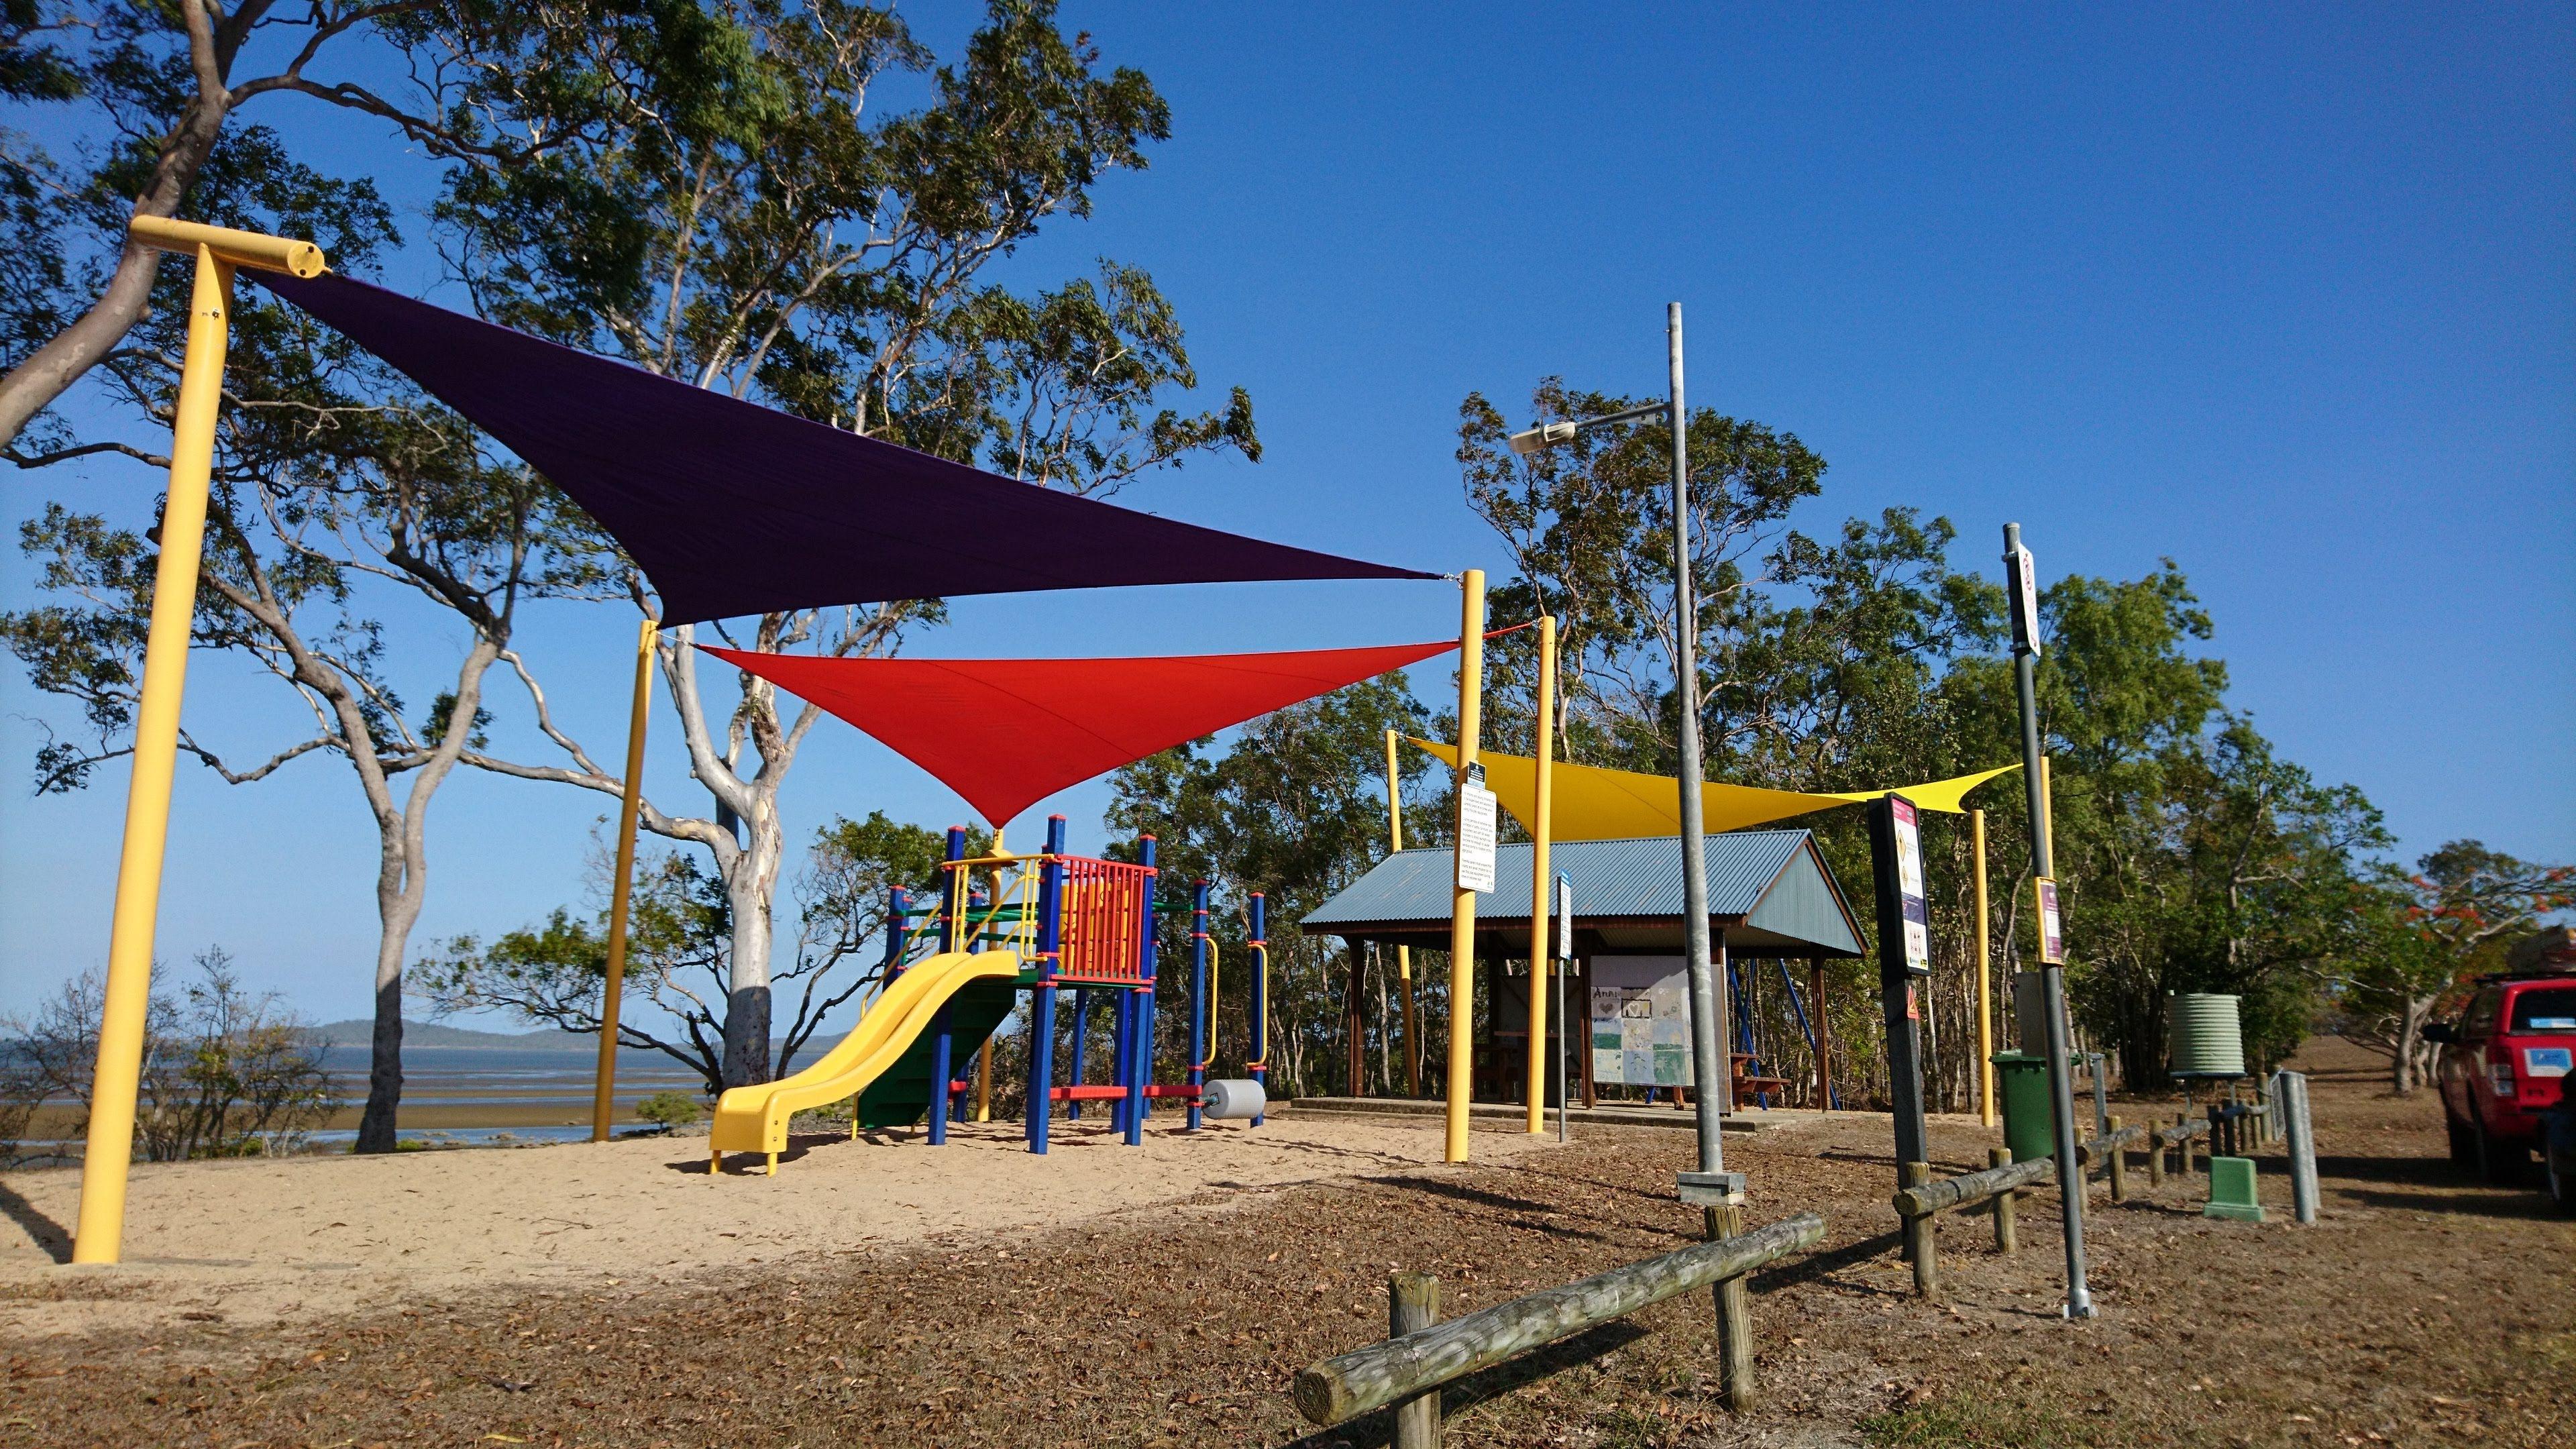 Mackay Regional Council Park